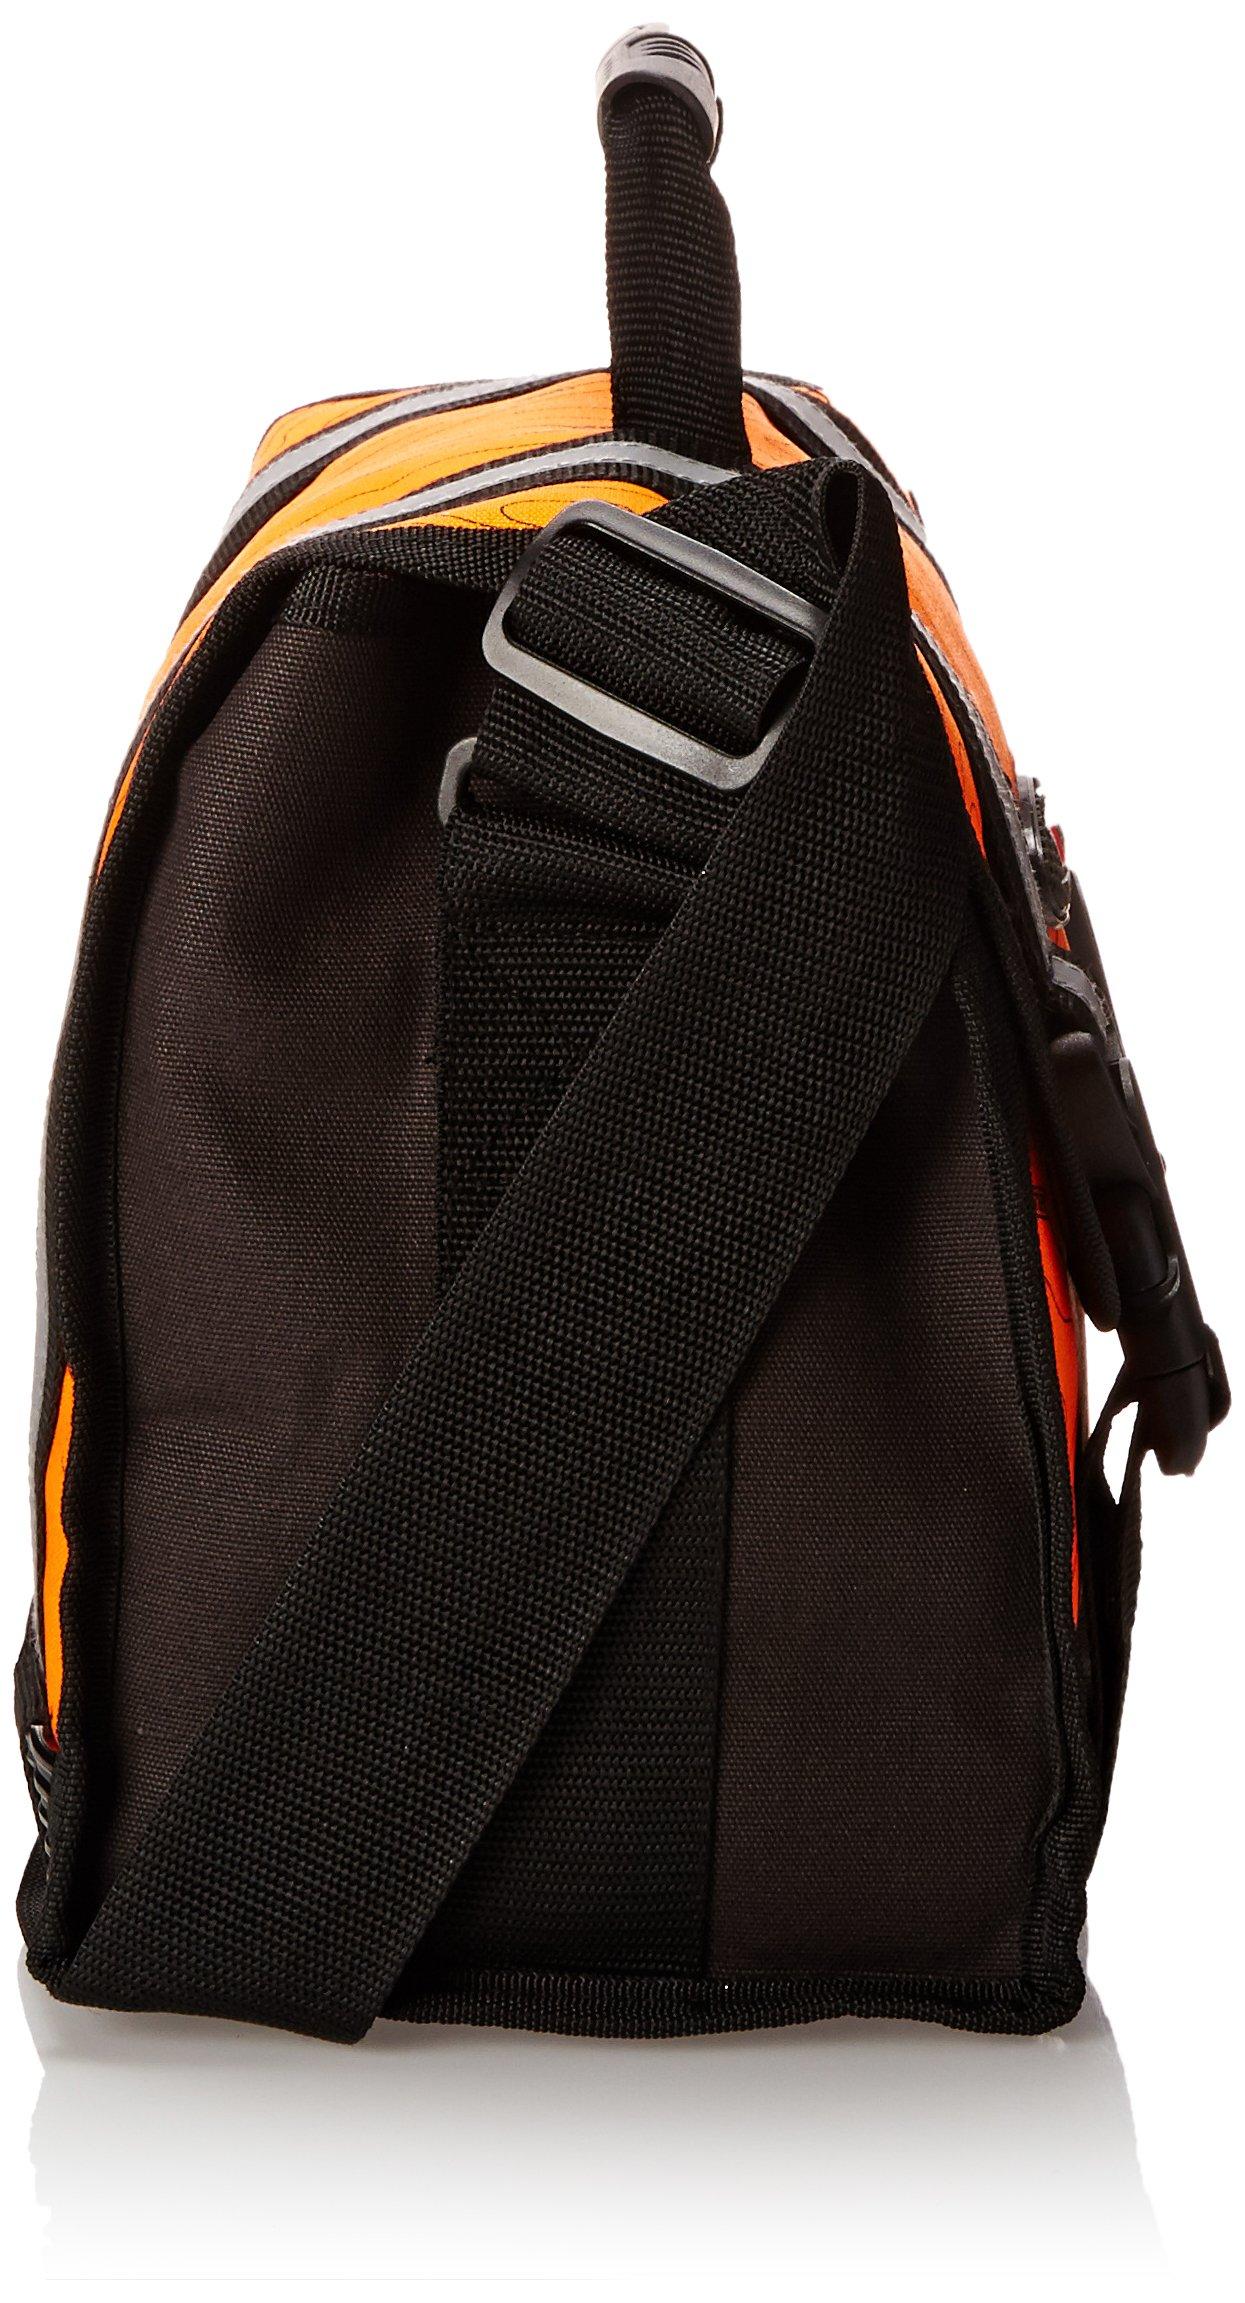 ARB ARB502 Orange Small Recovery Bag by ARB (Image #2)